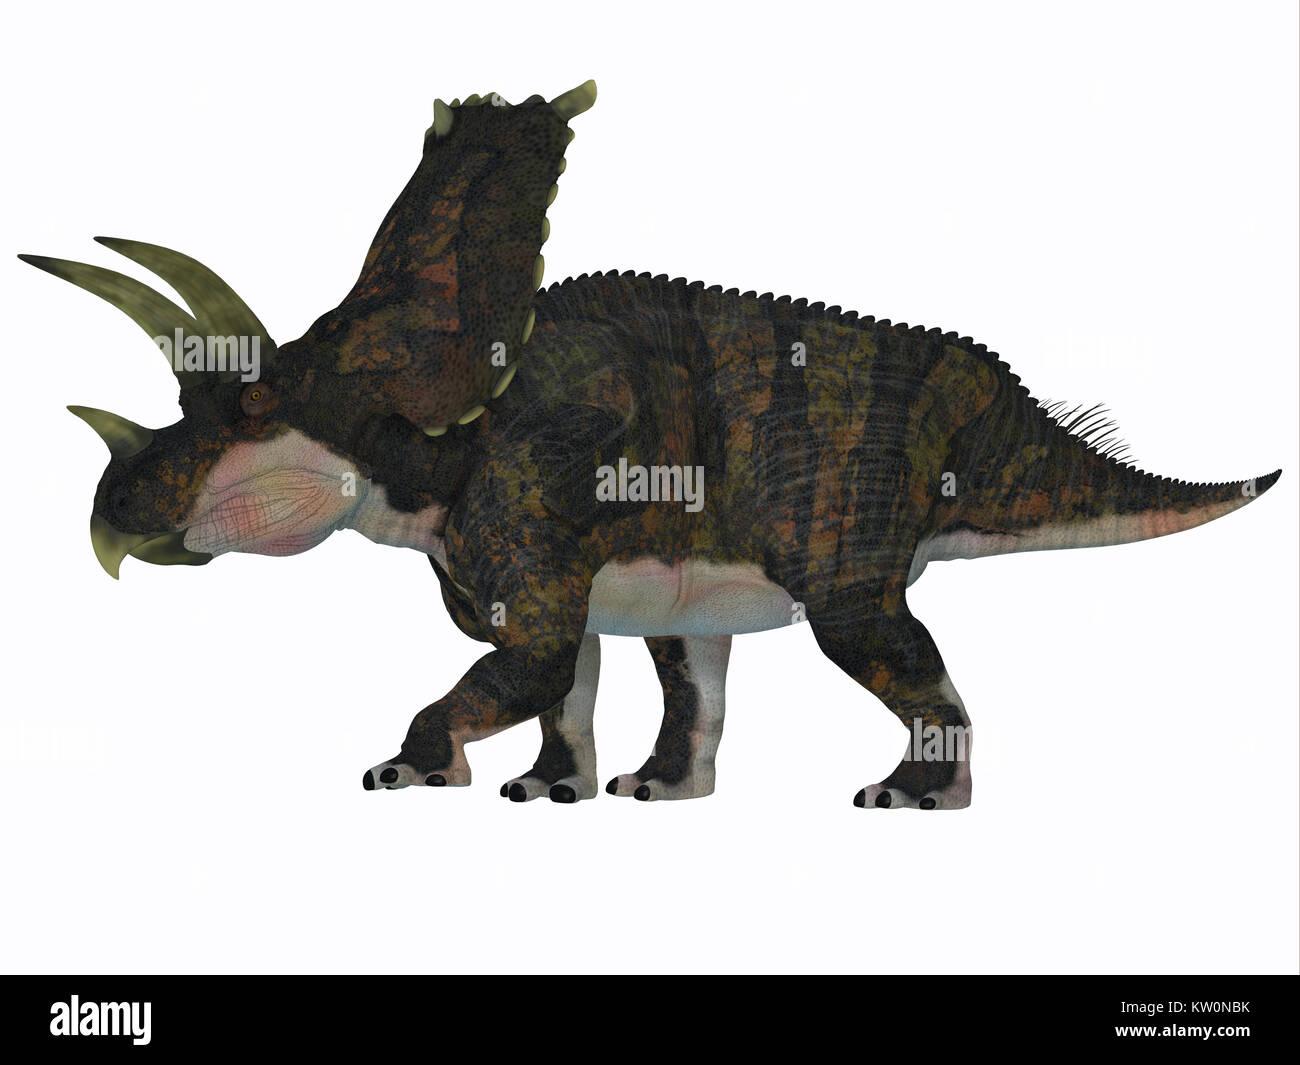 Bravoceratops Dinosaur Side Profile - Bravoceratops was a herbivorous ceratopsian dinosaur that lived in Texas, - Stock Image